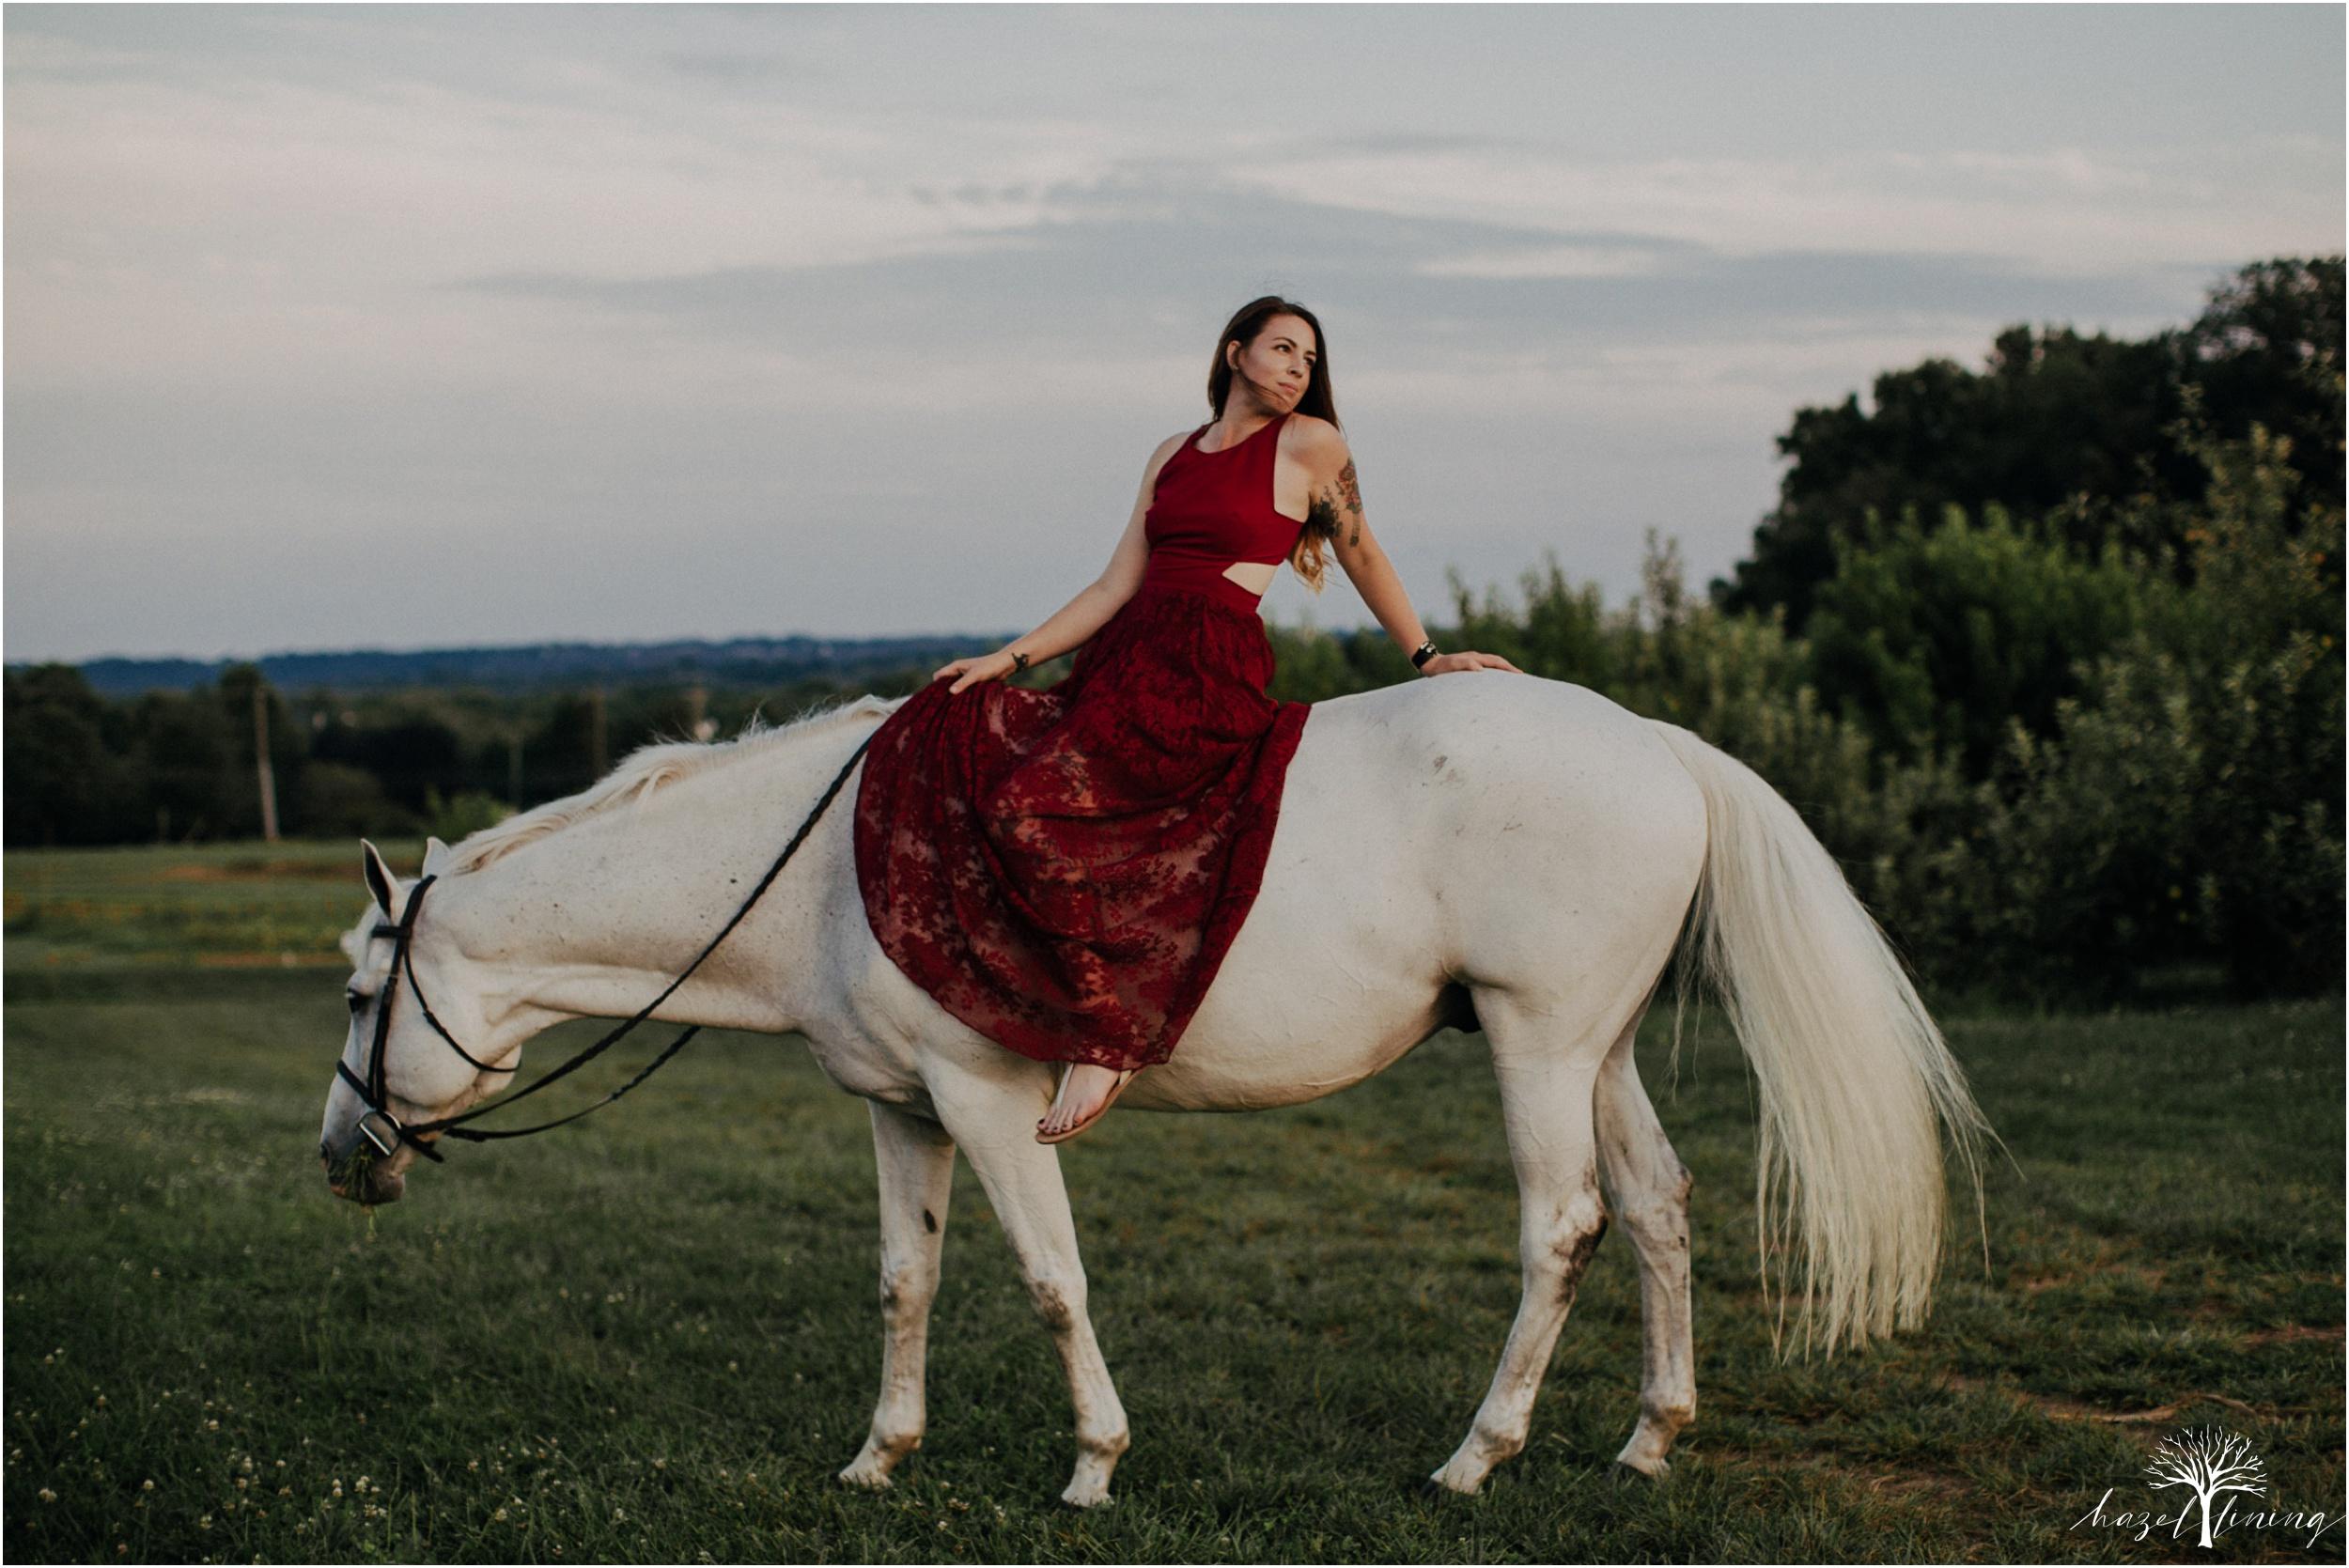 taylor-adams-and-horse-delaware-valley-university-delval-summer-equestrian-portrait-session-hazel-lining-photography-destination-elopement-wedding-engagement-photography_0051.jpg